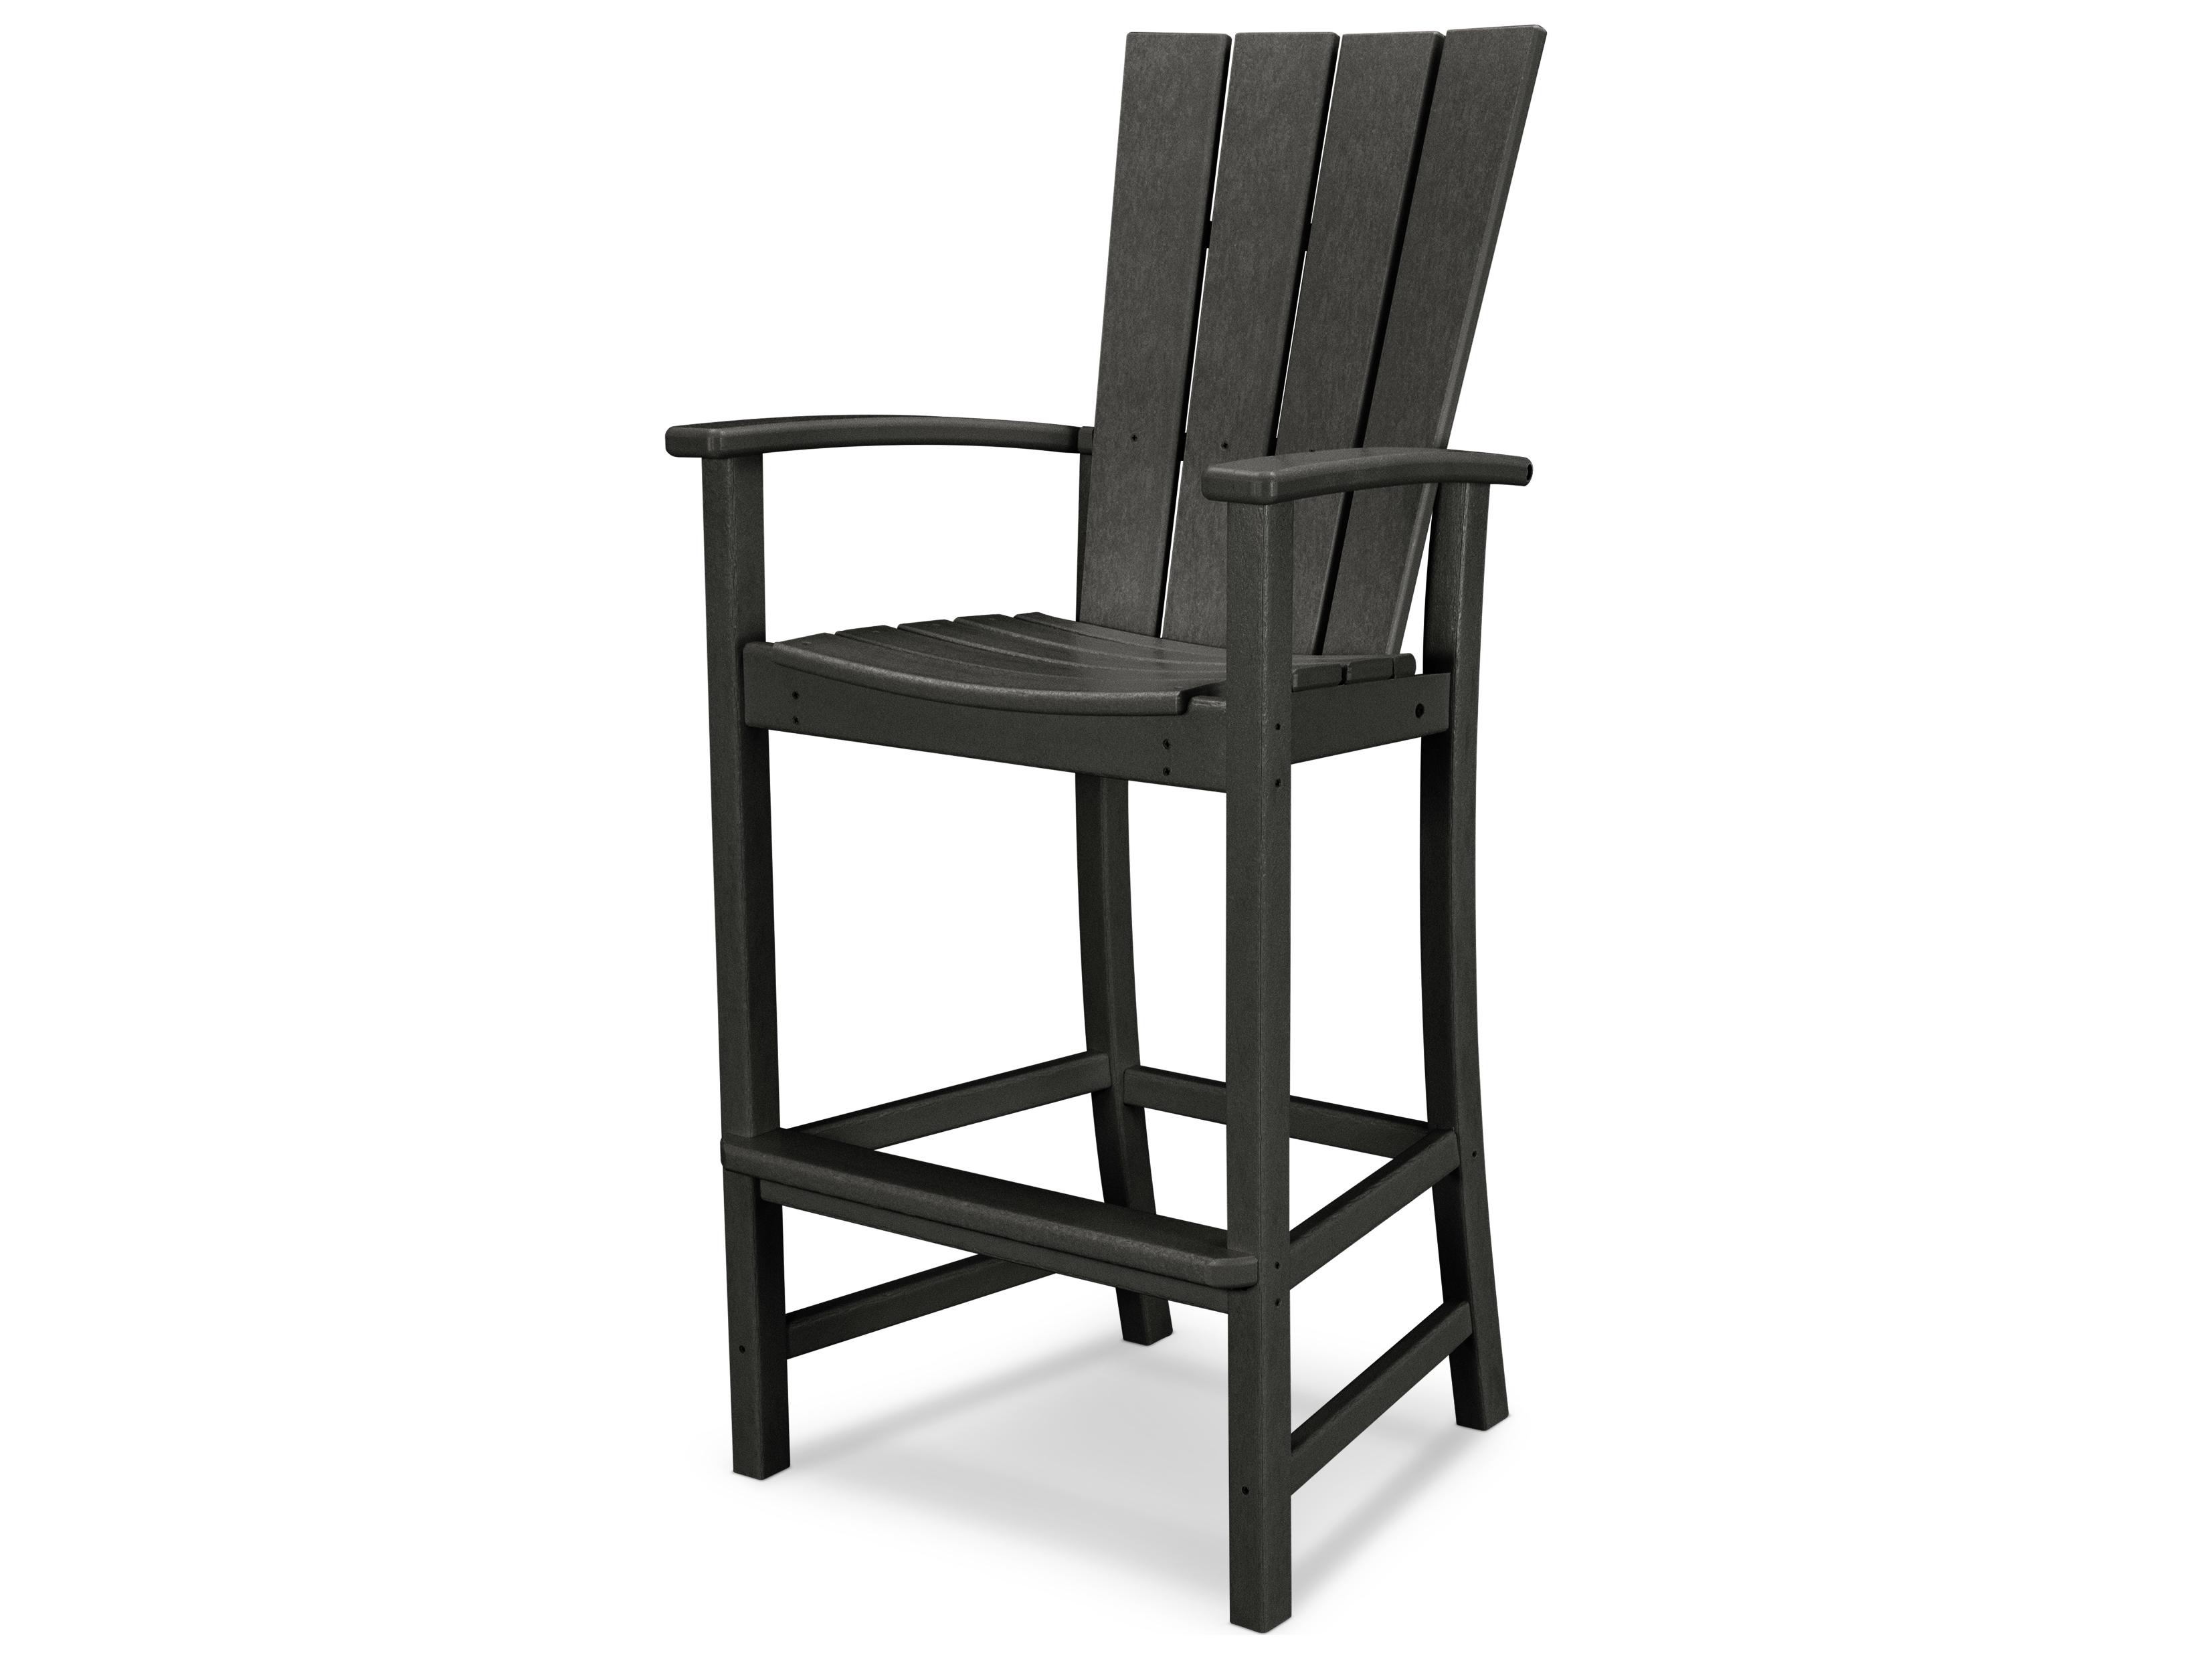 Polywood 174 Quattro Recycled Plastic Adirondack Bar Chair